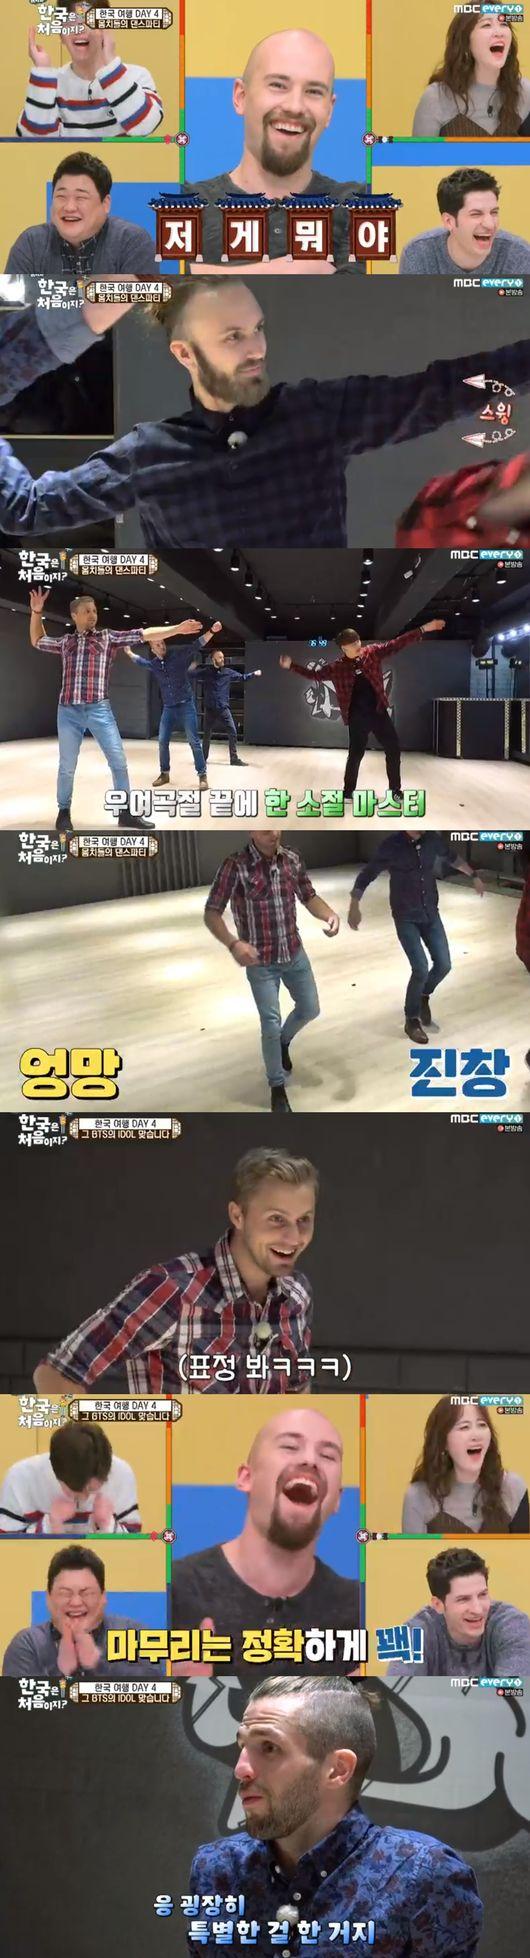 """BTS 춤 배우기×PC방 게임×치맥"" '어서와' 스웨덴 친구들, 마지막까지 알찬 韓여행기[종합]"